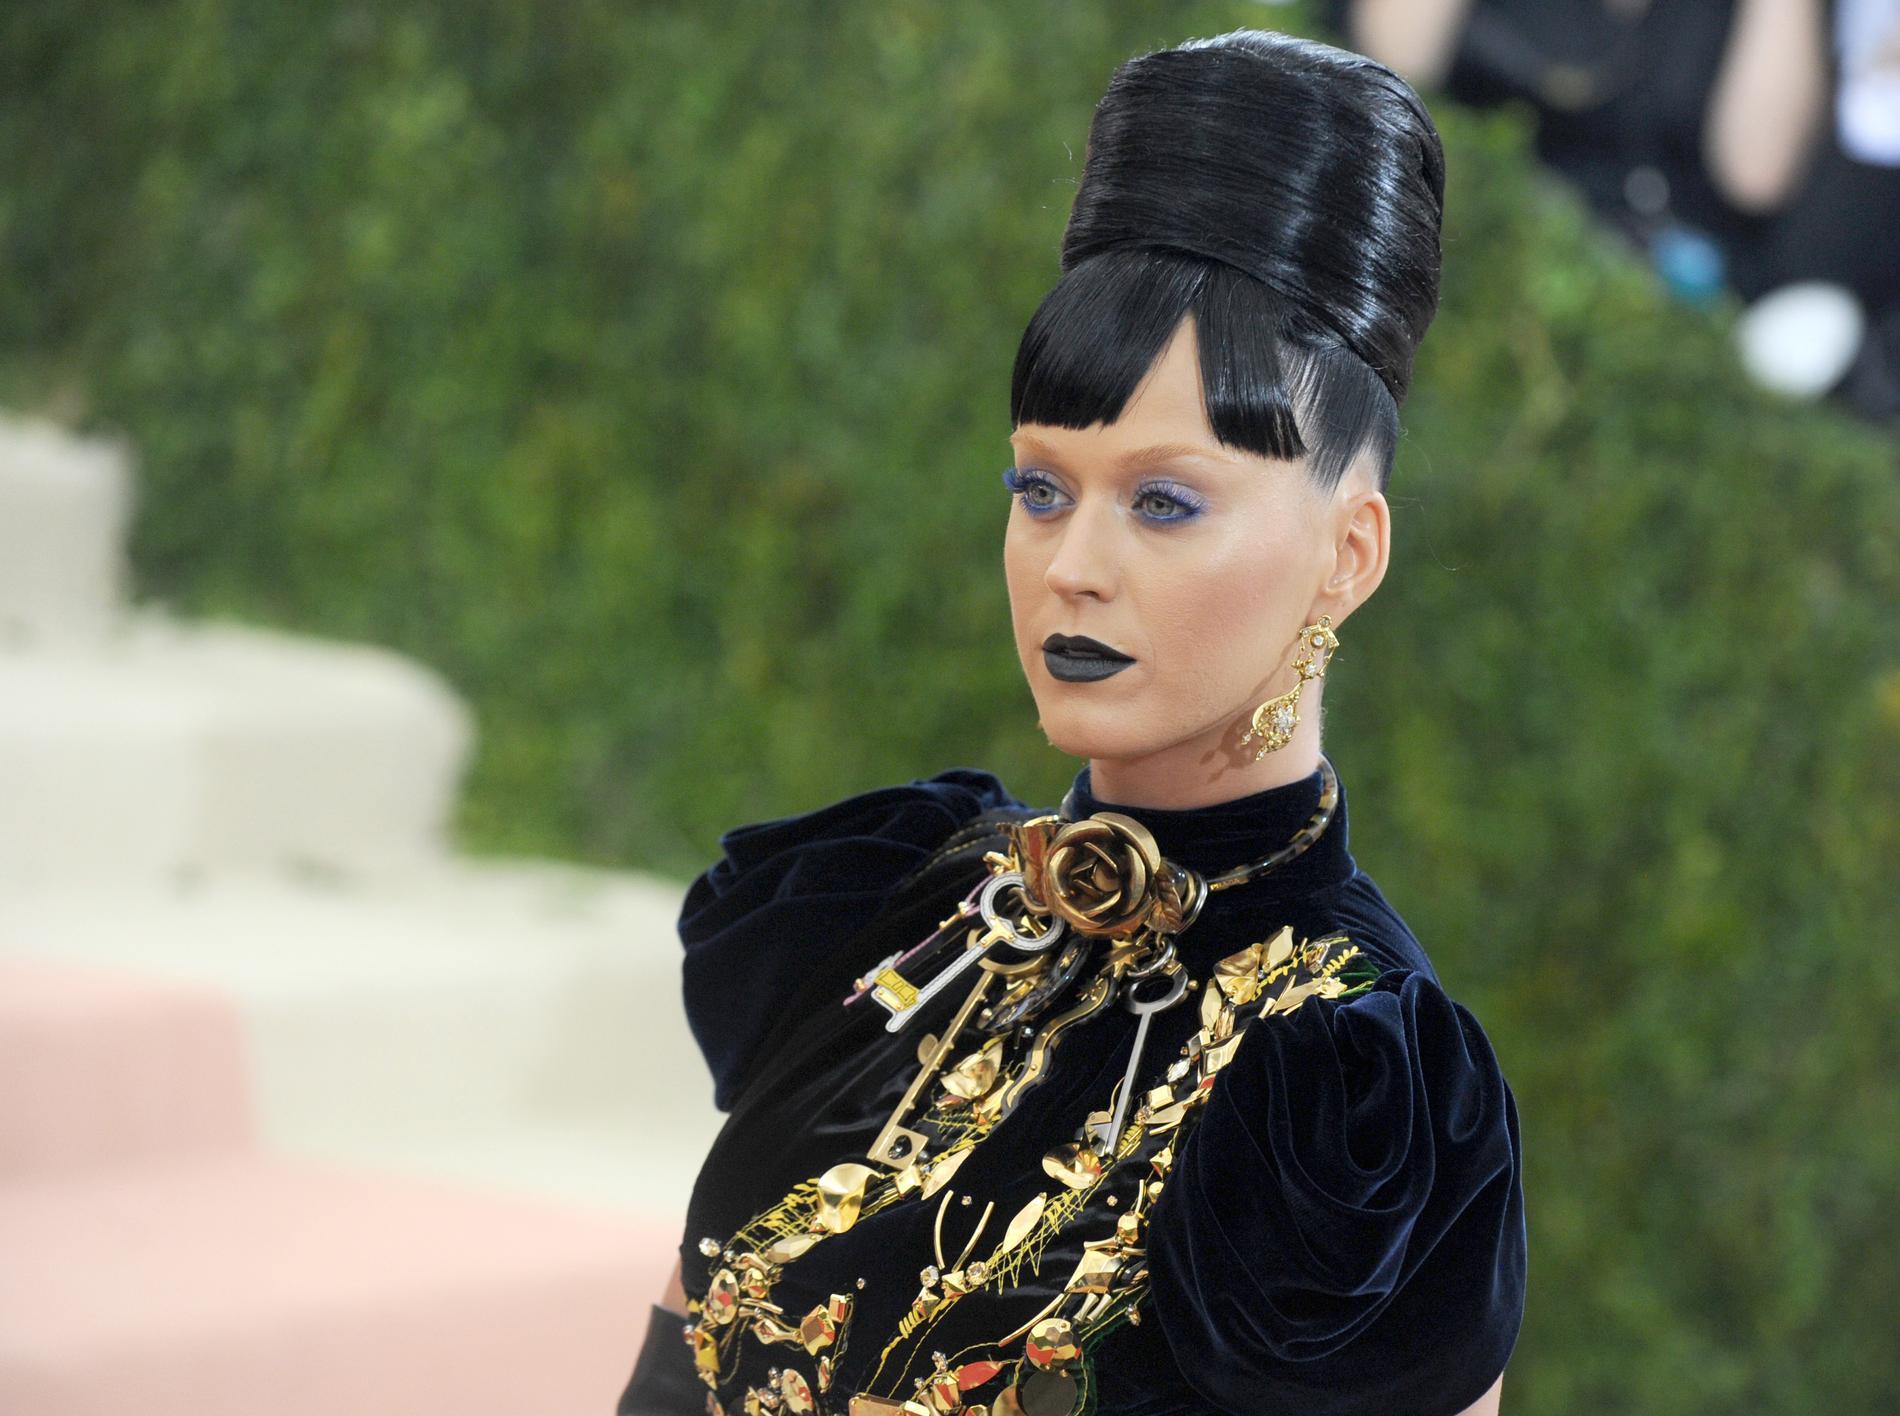 Les Coiffures Les Plus Memorables Du Gala Du Met Madame Figaro